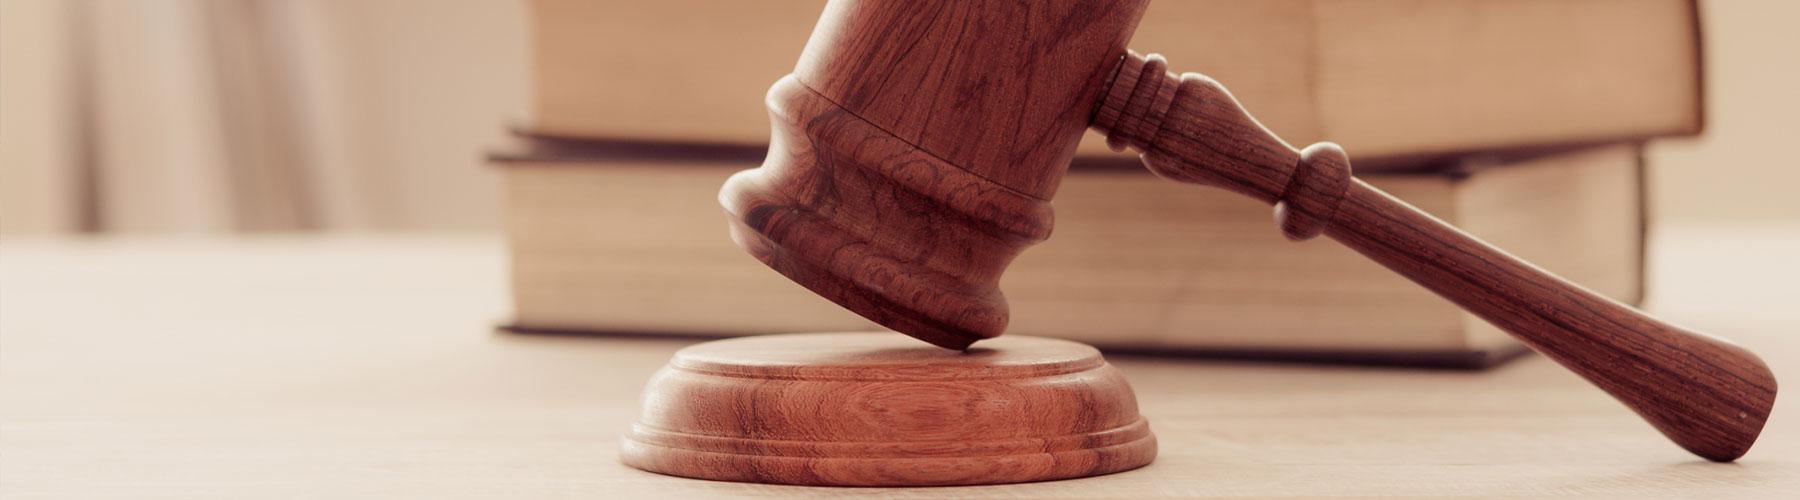 lavie koliousis petra avocat avocat cannes cabinet d 39 avocat 06. Black Bedroom Furniture Sets. Home Design Ideas